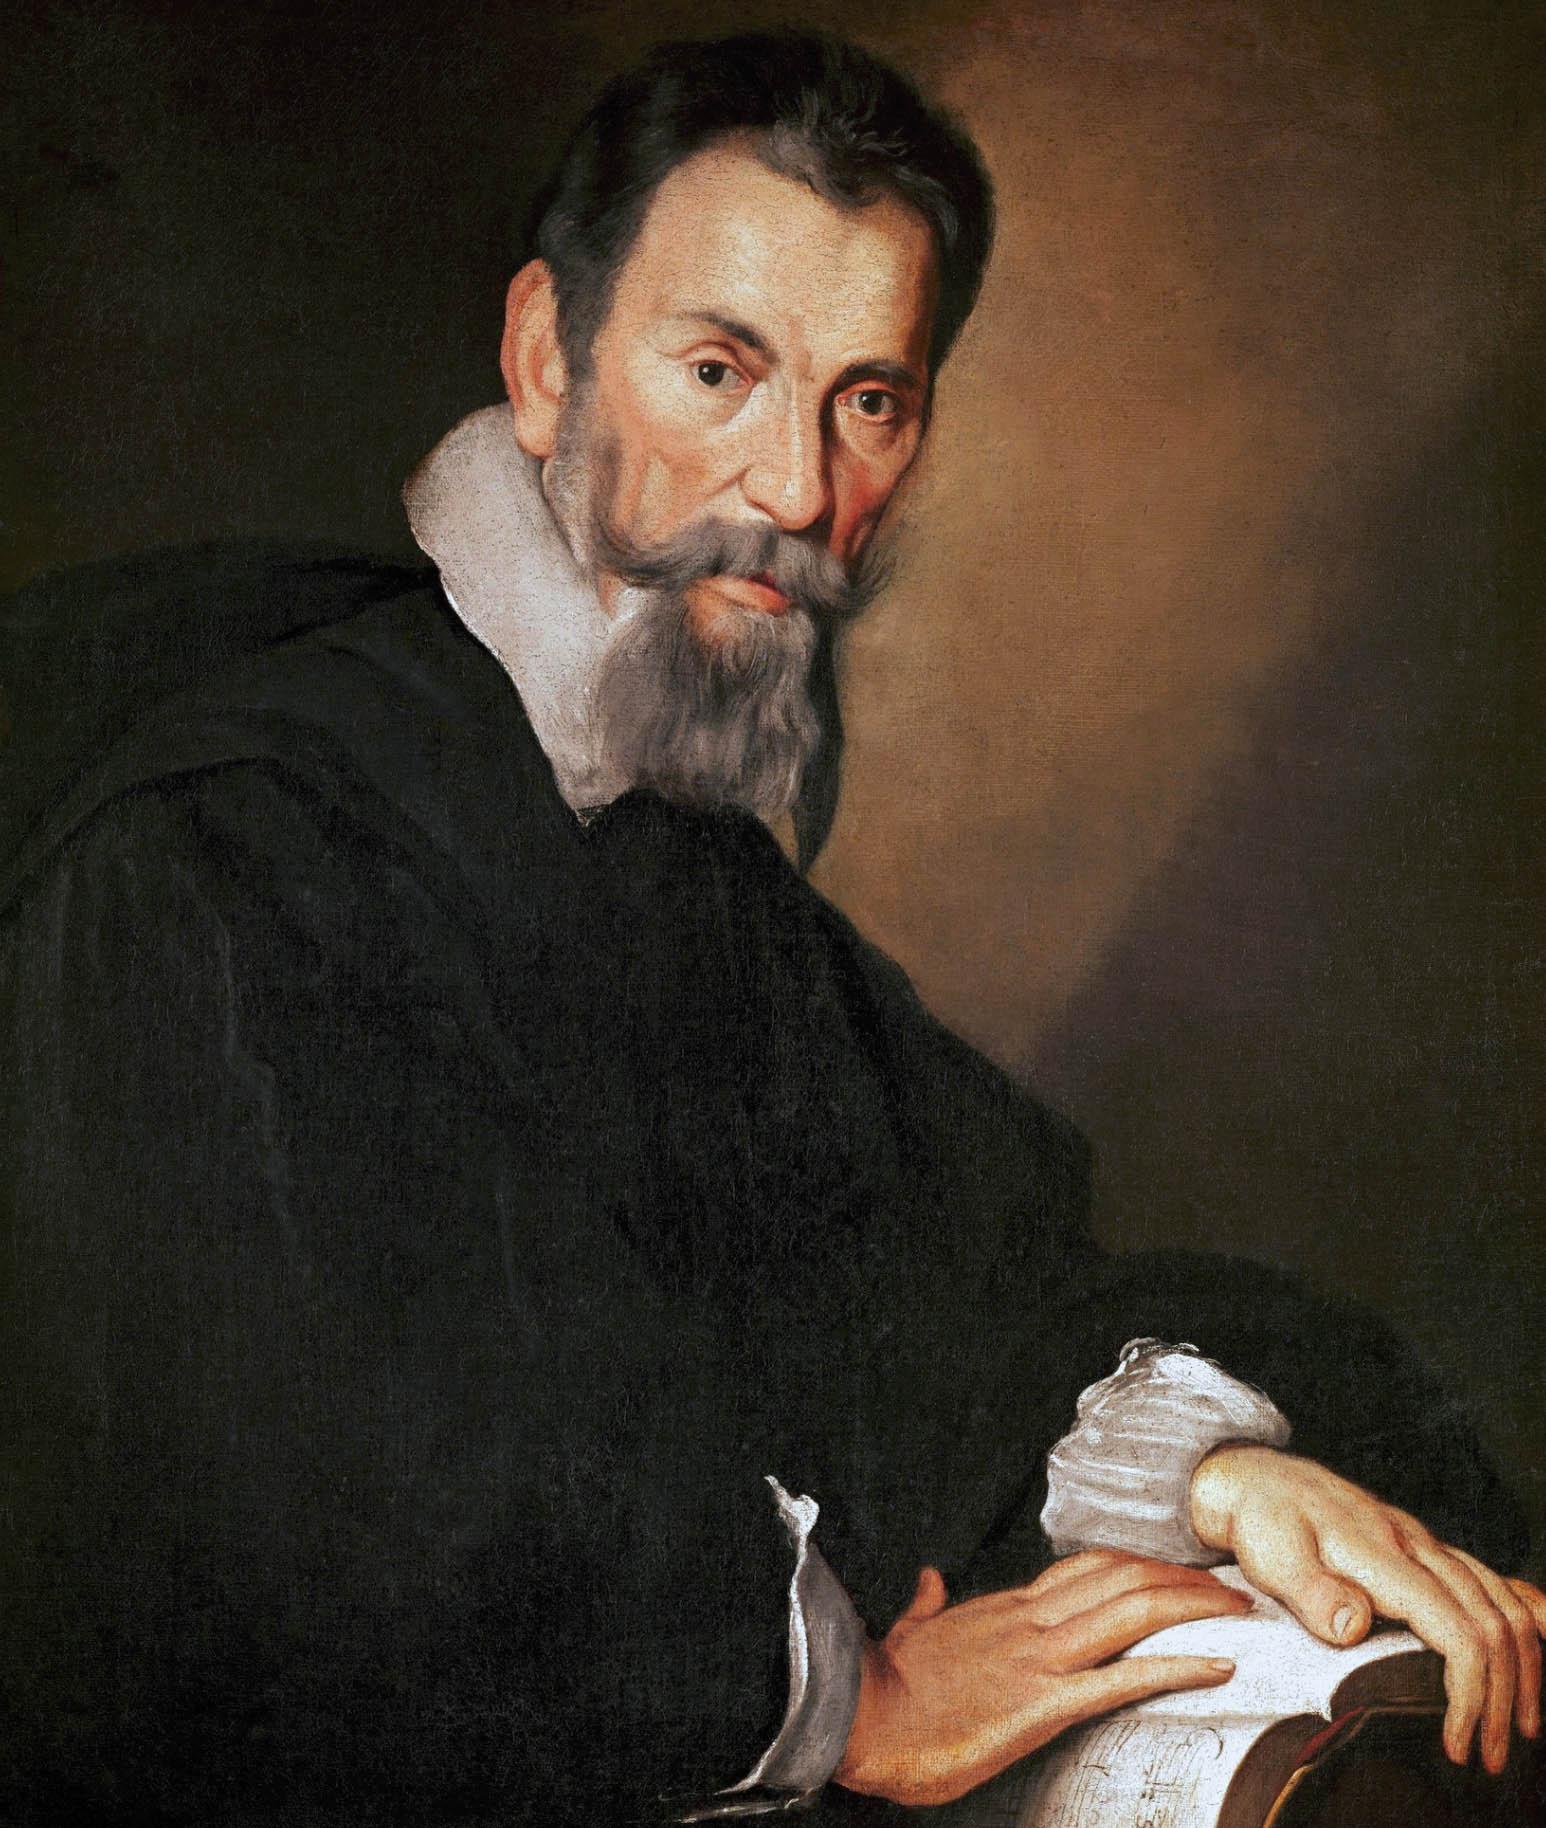 Claudio Monteverdi by Bernardo Strozzi -1640 - Venetian music school